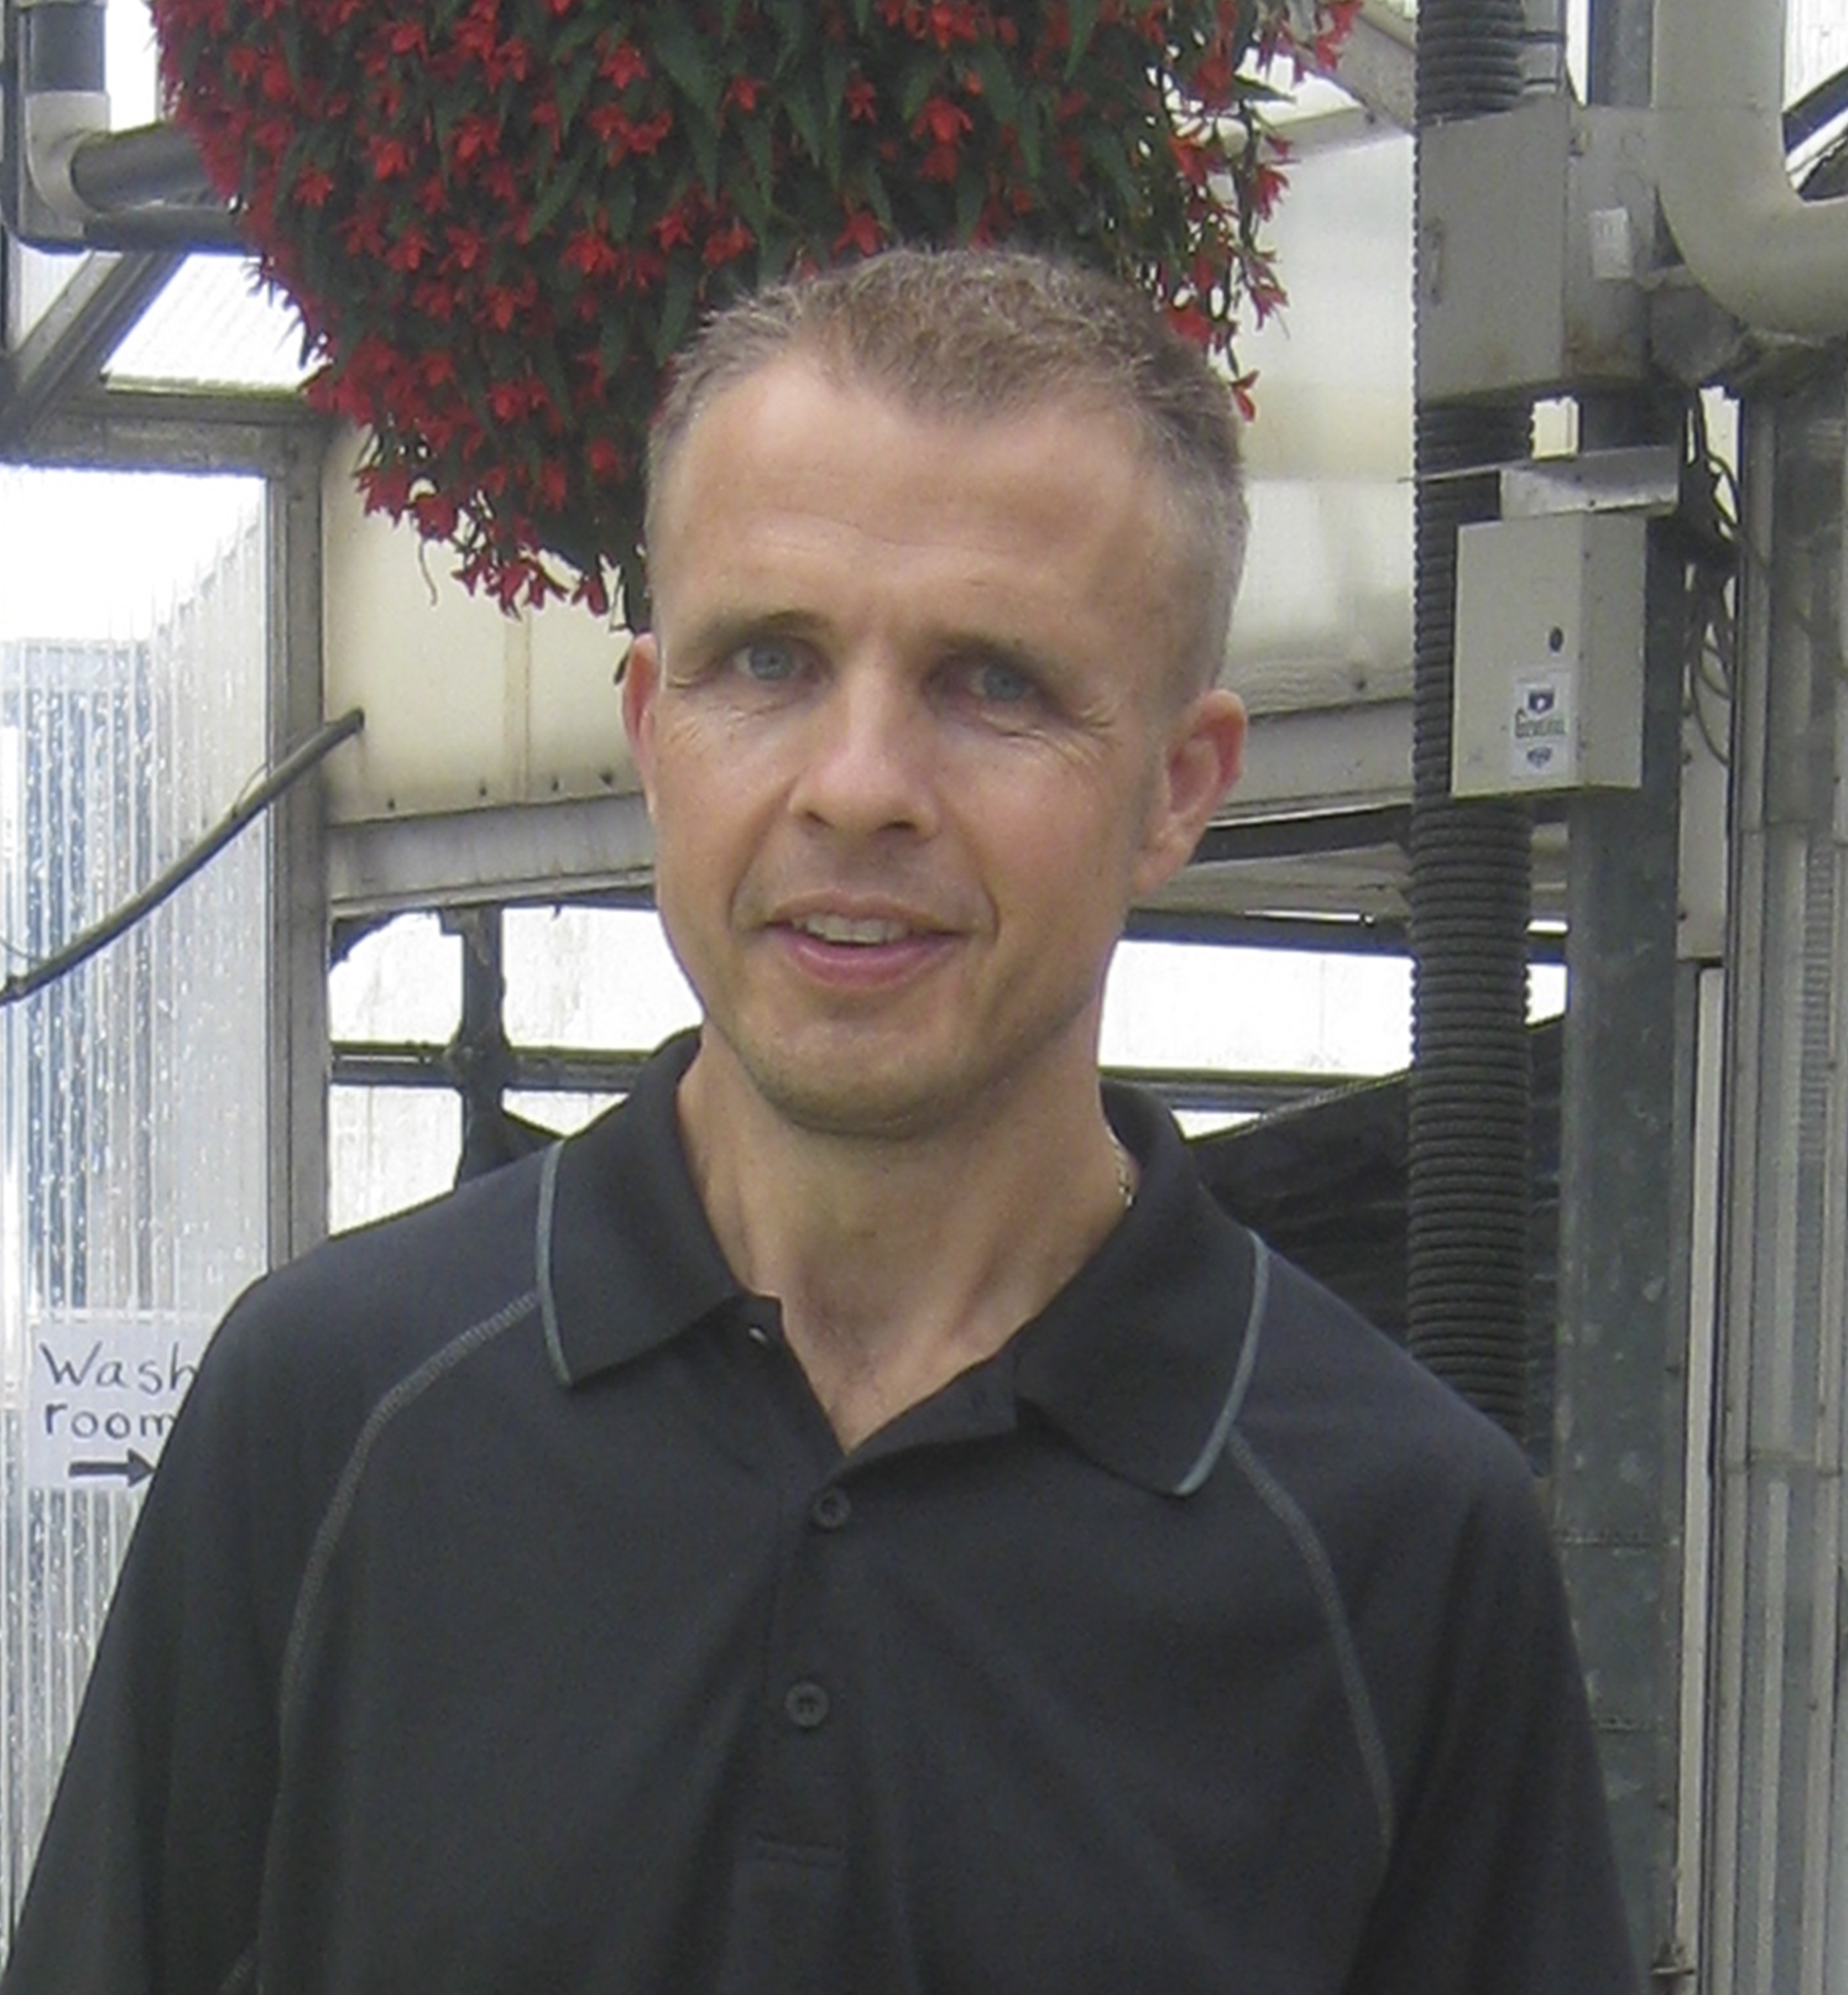 Paul van der Zalm